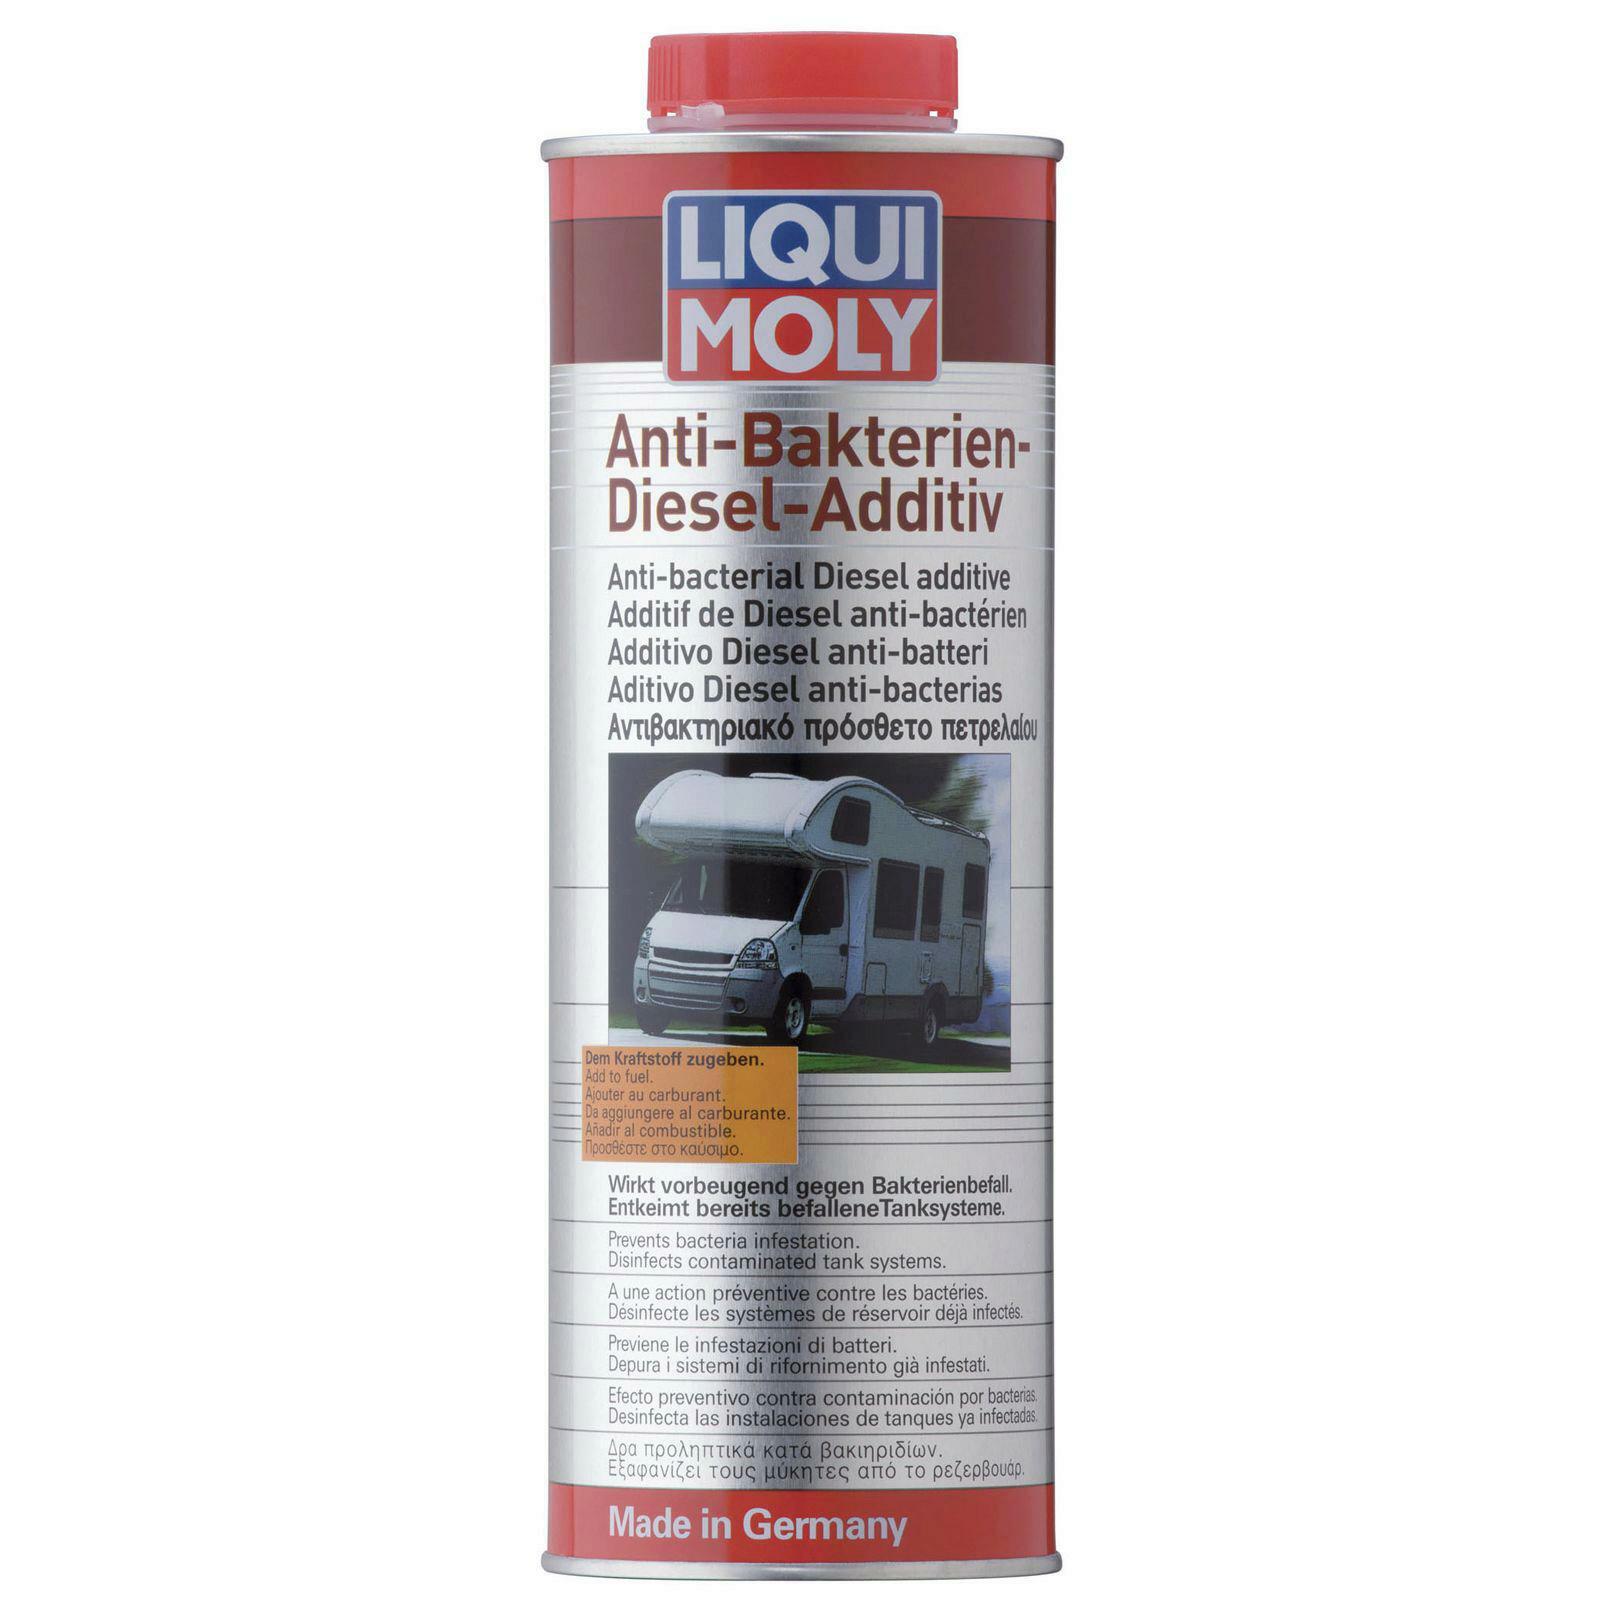 Liqui Moly Anti-Bakterien-Diesel-Additiv 1l